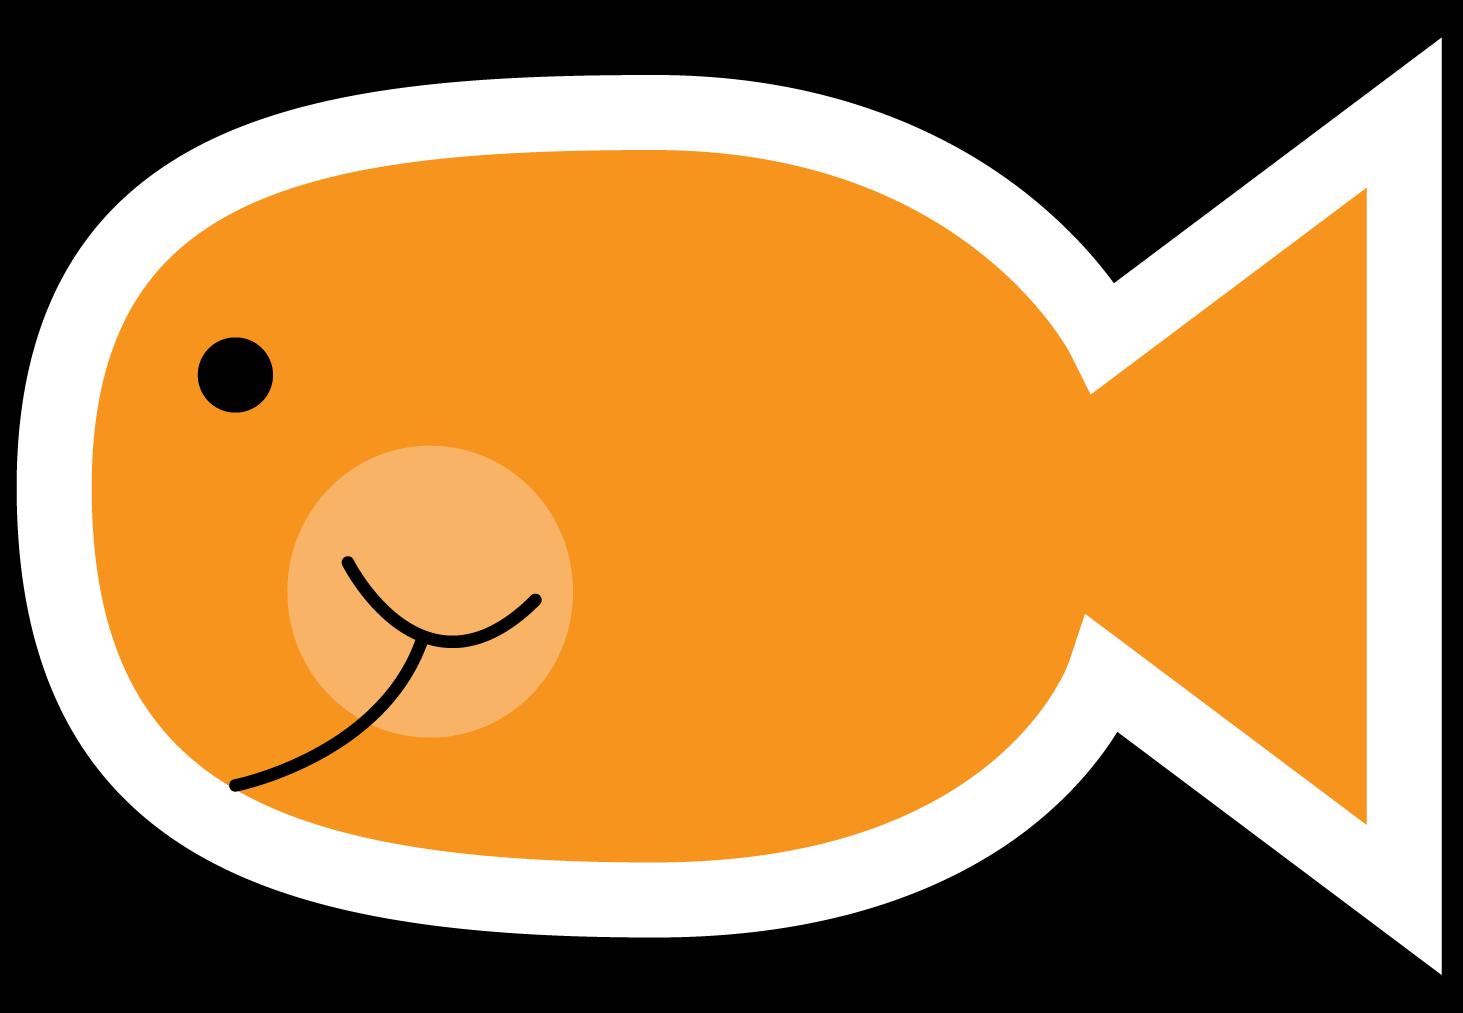 Goldfish clipart fish cracker. Free download best x